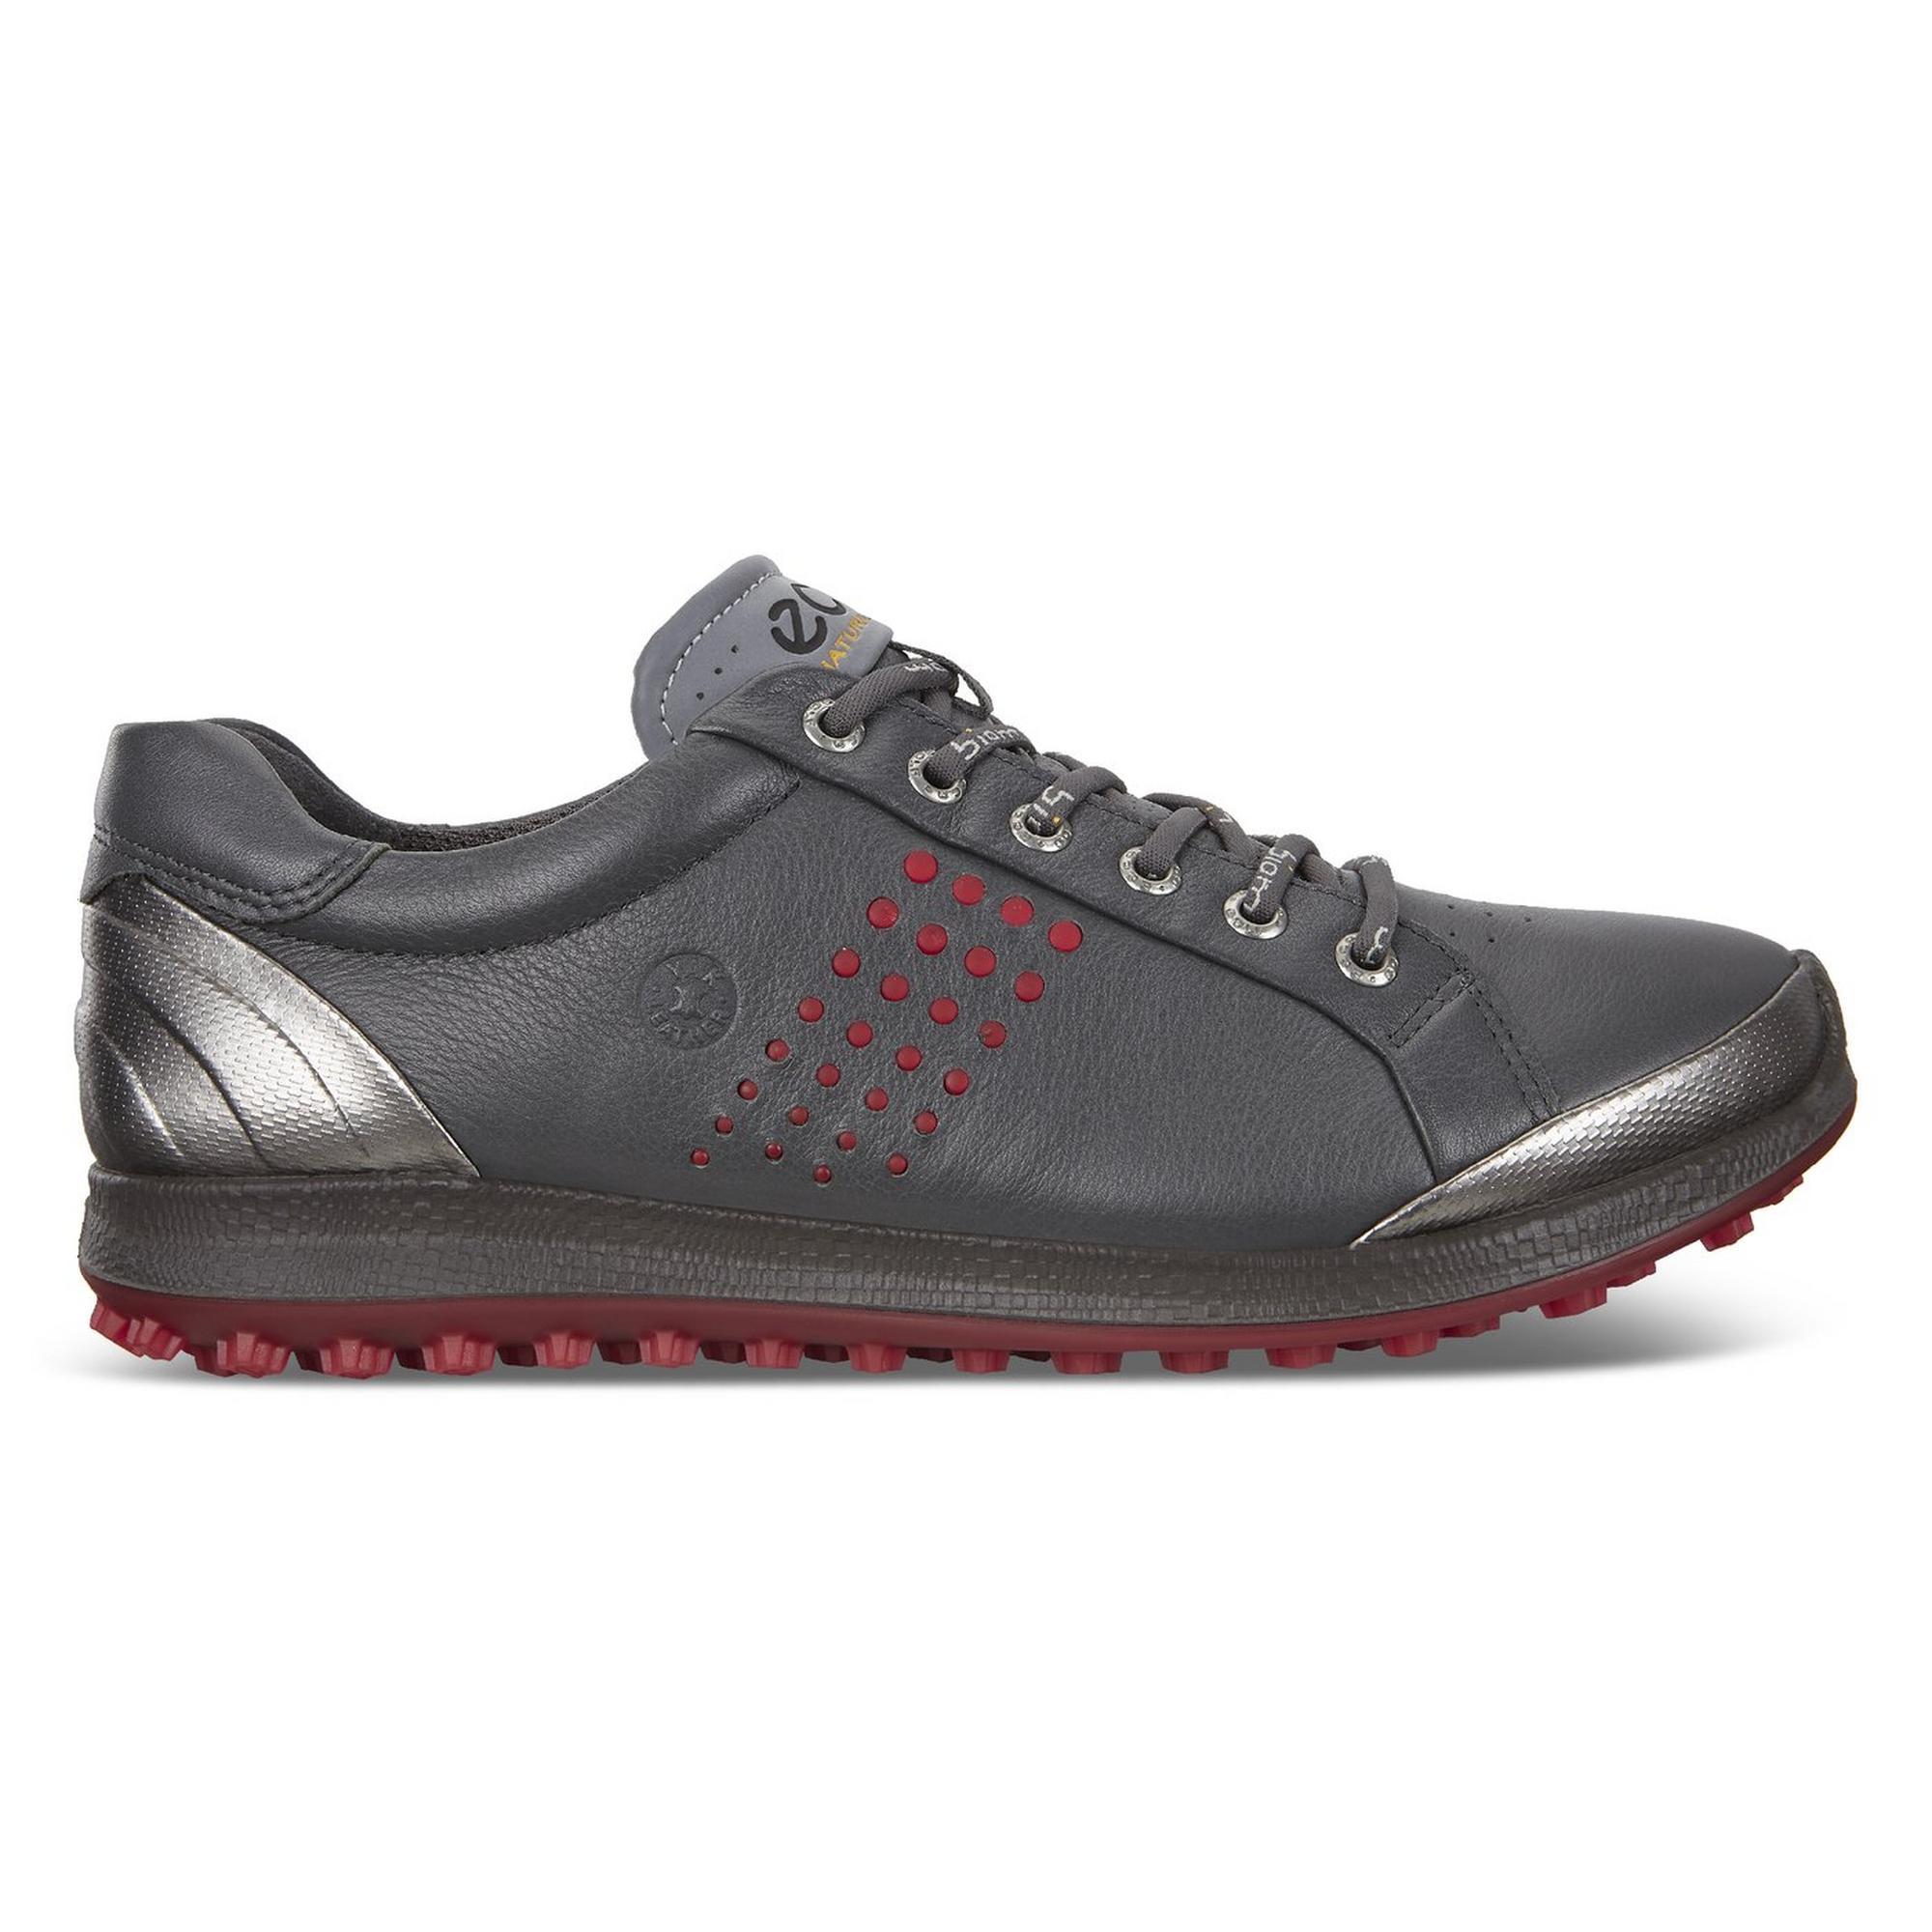 Chaussures Biom Hybrid 2 sans crampons pour hommes - Gris/Rouge